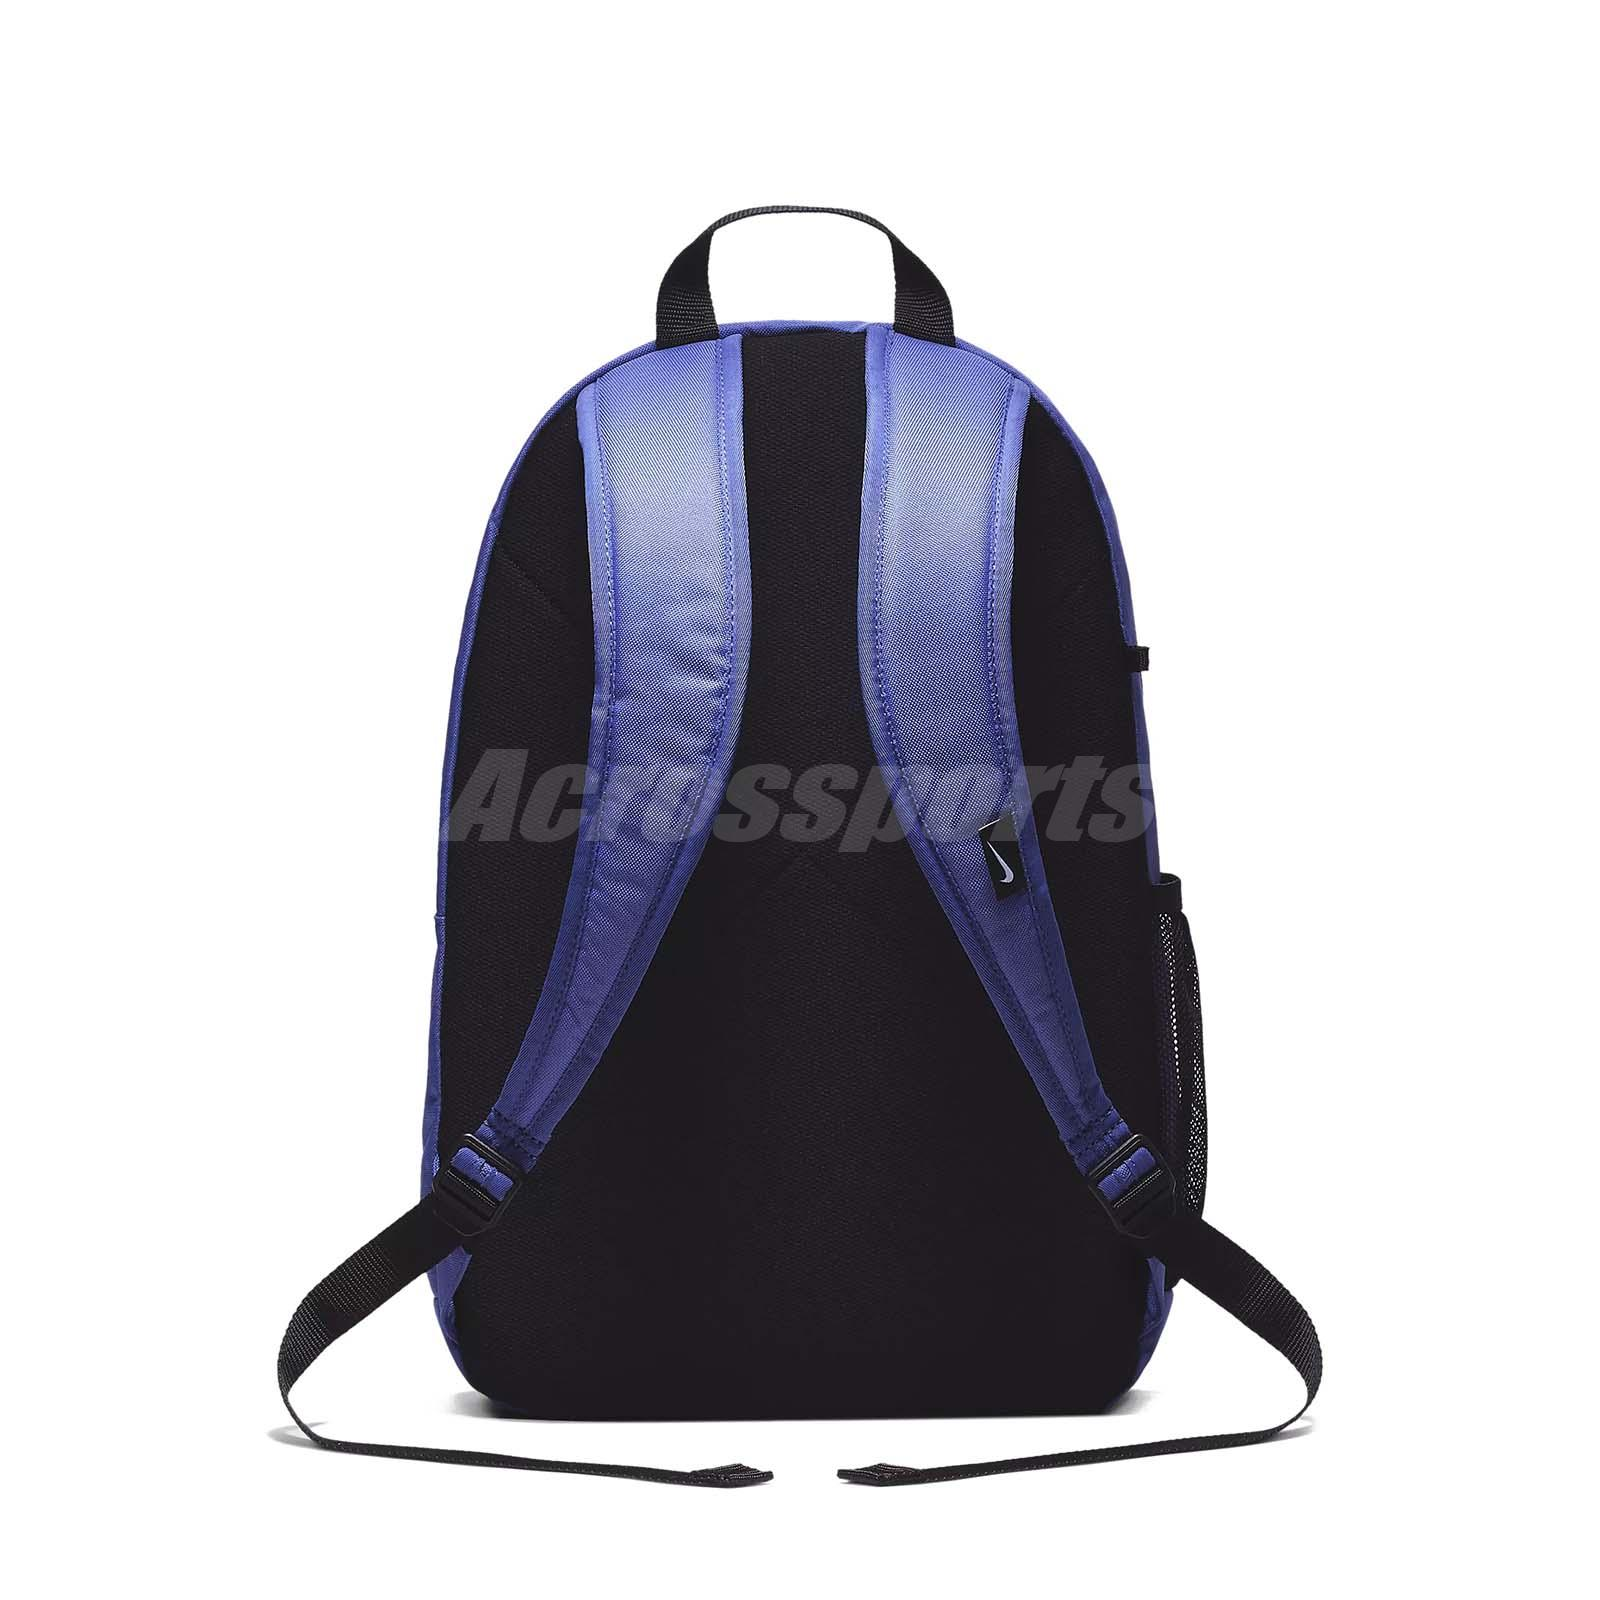 Details about Nike Elemental Kids Backpack School Bag Sports Running  Fitness Purple BA5405-554 587b645d6c5a0